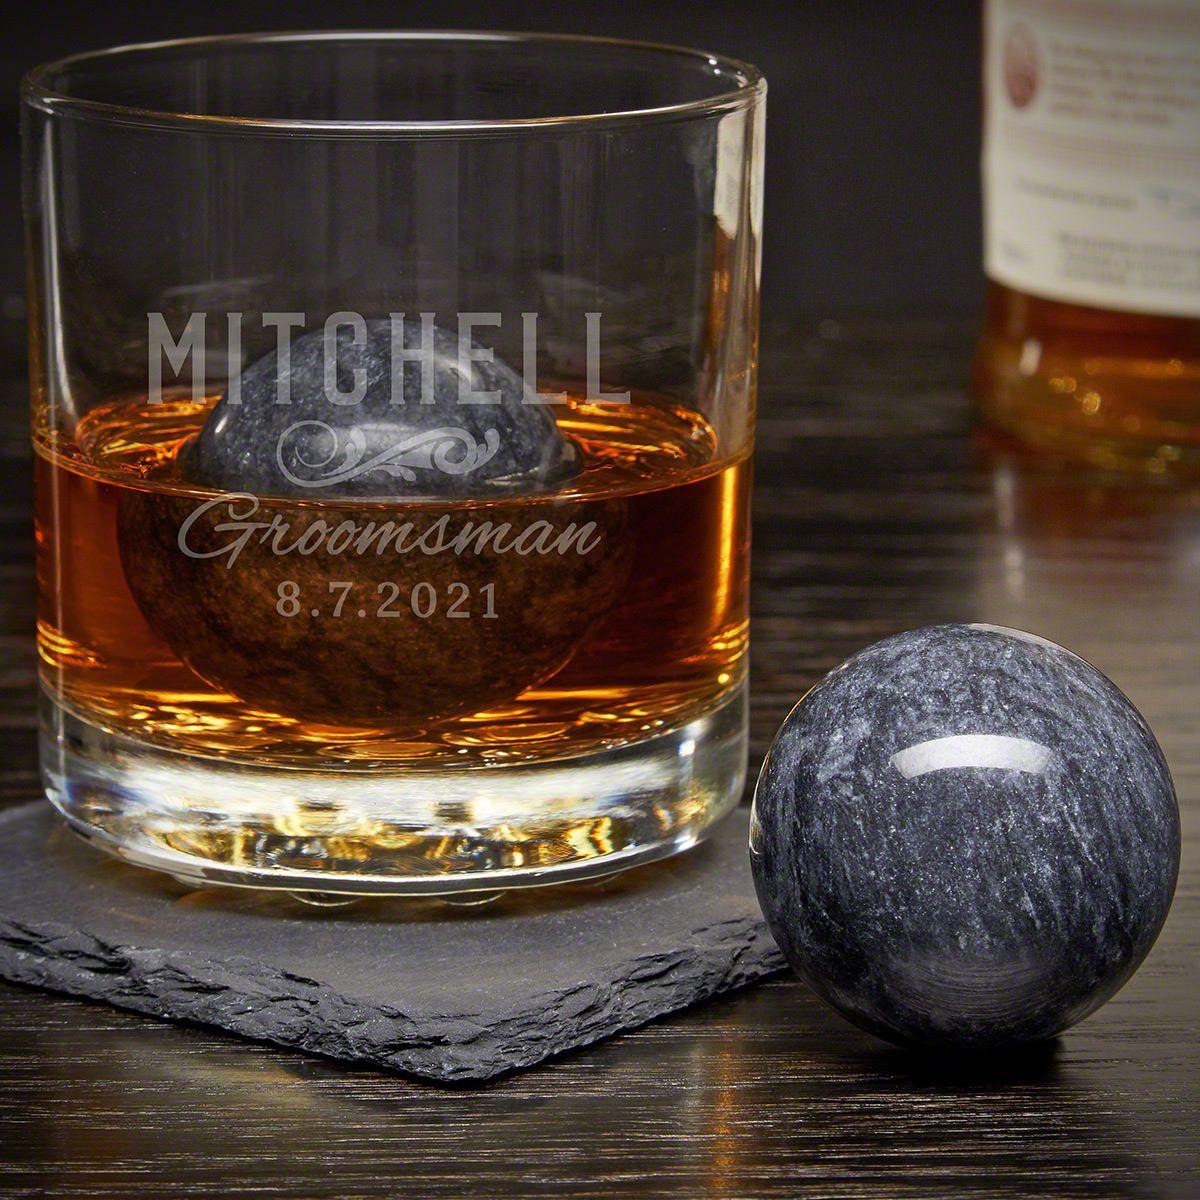 Classic Groomsman Engraved Rocks Glass Set Groomsmen Gifts